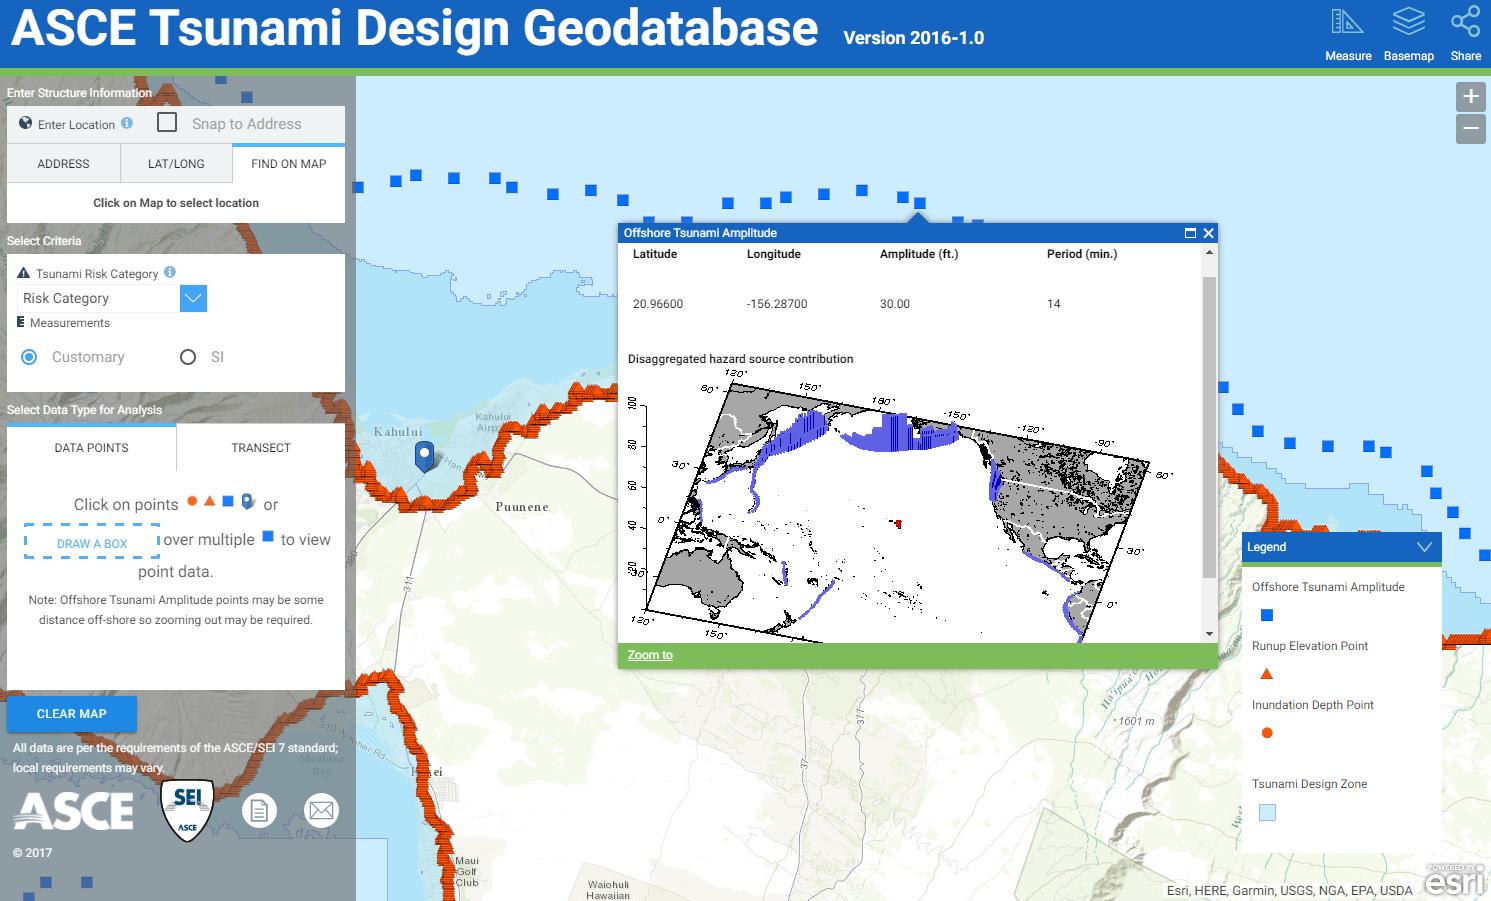 Offshore Tsunami Amplitude Analysis